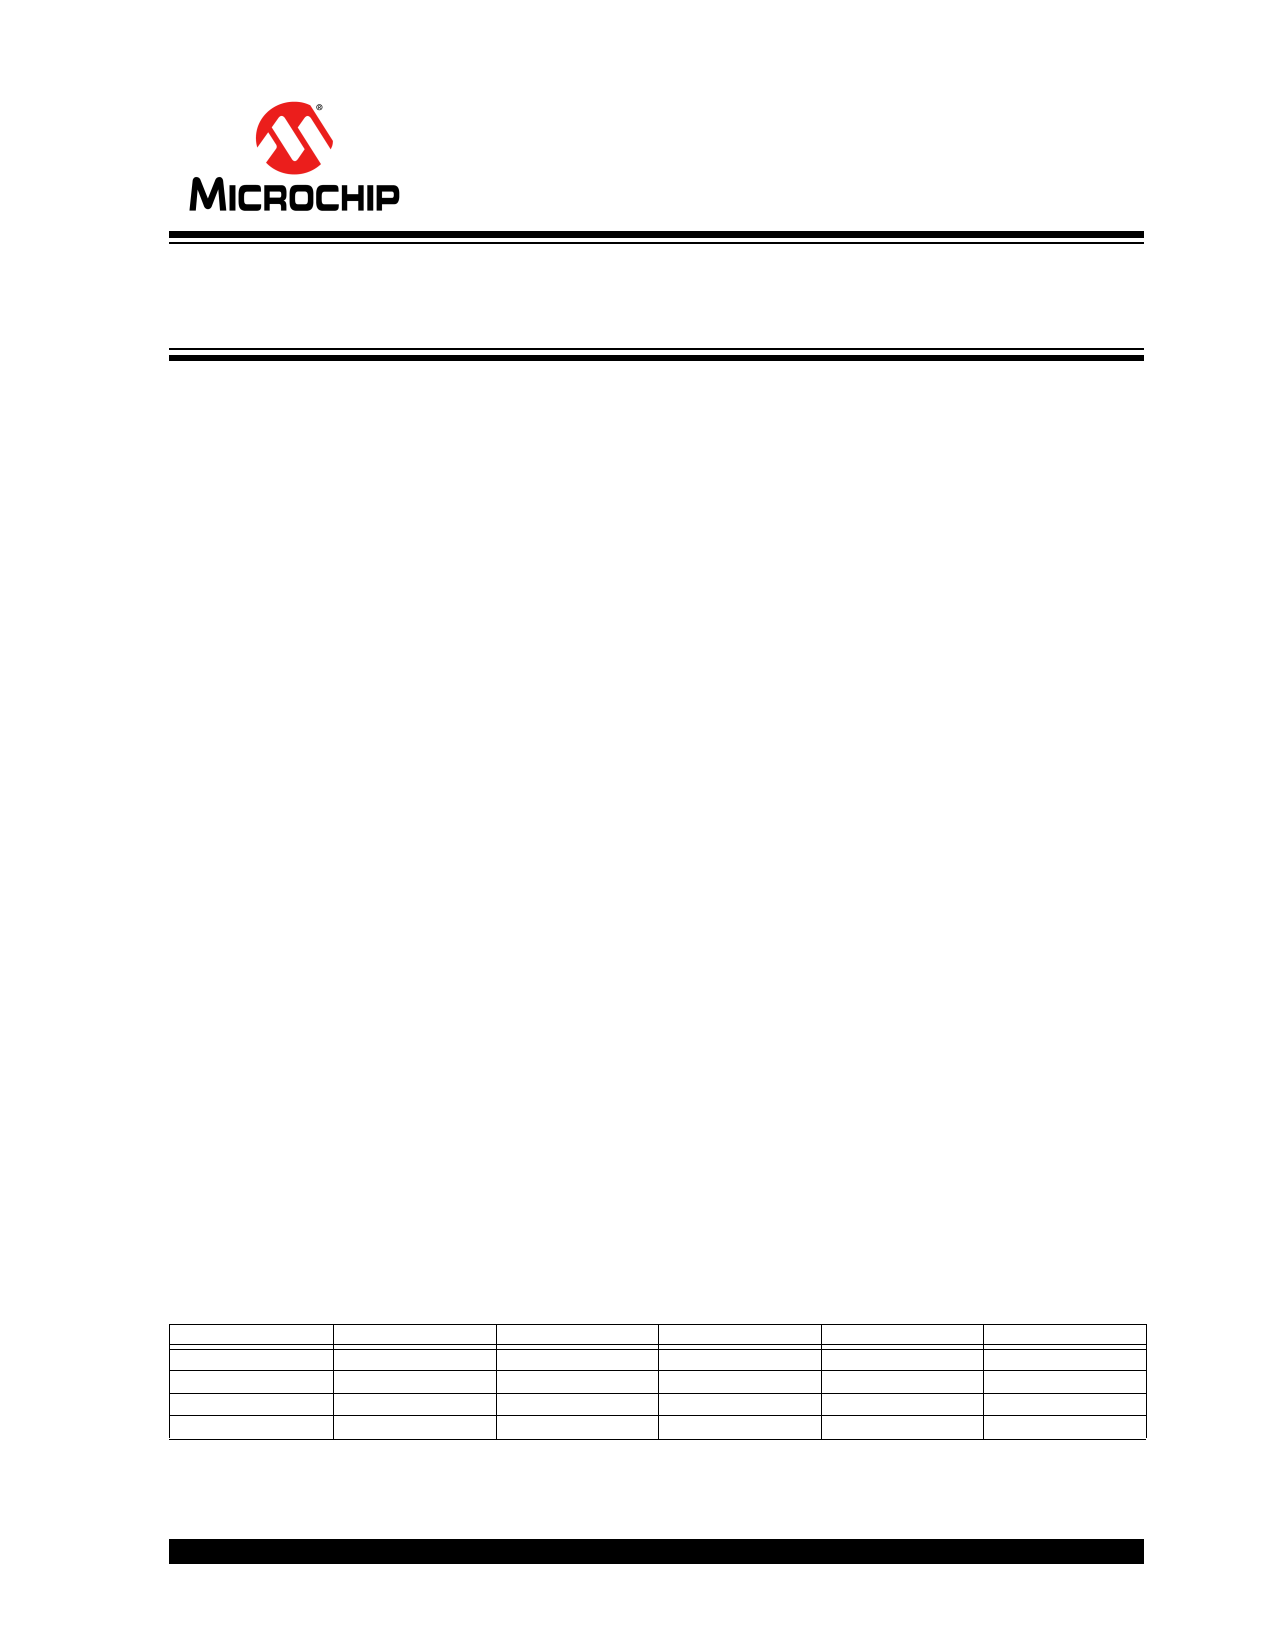 PIC24HJ32GP302 데이터시트 및 PIC24HJ32GP302 PDF